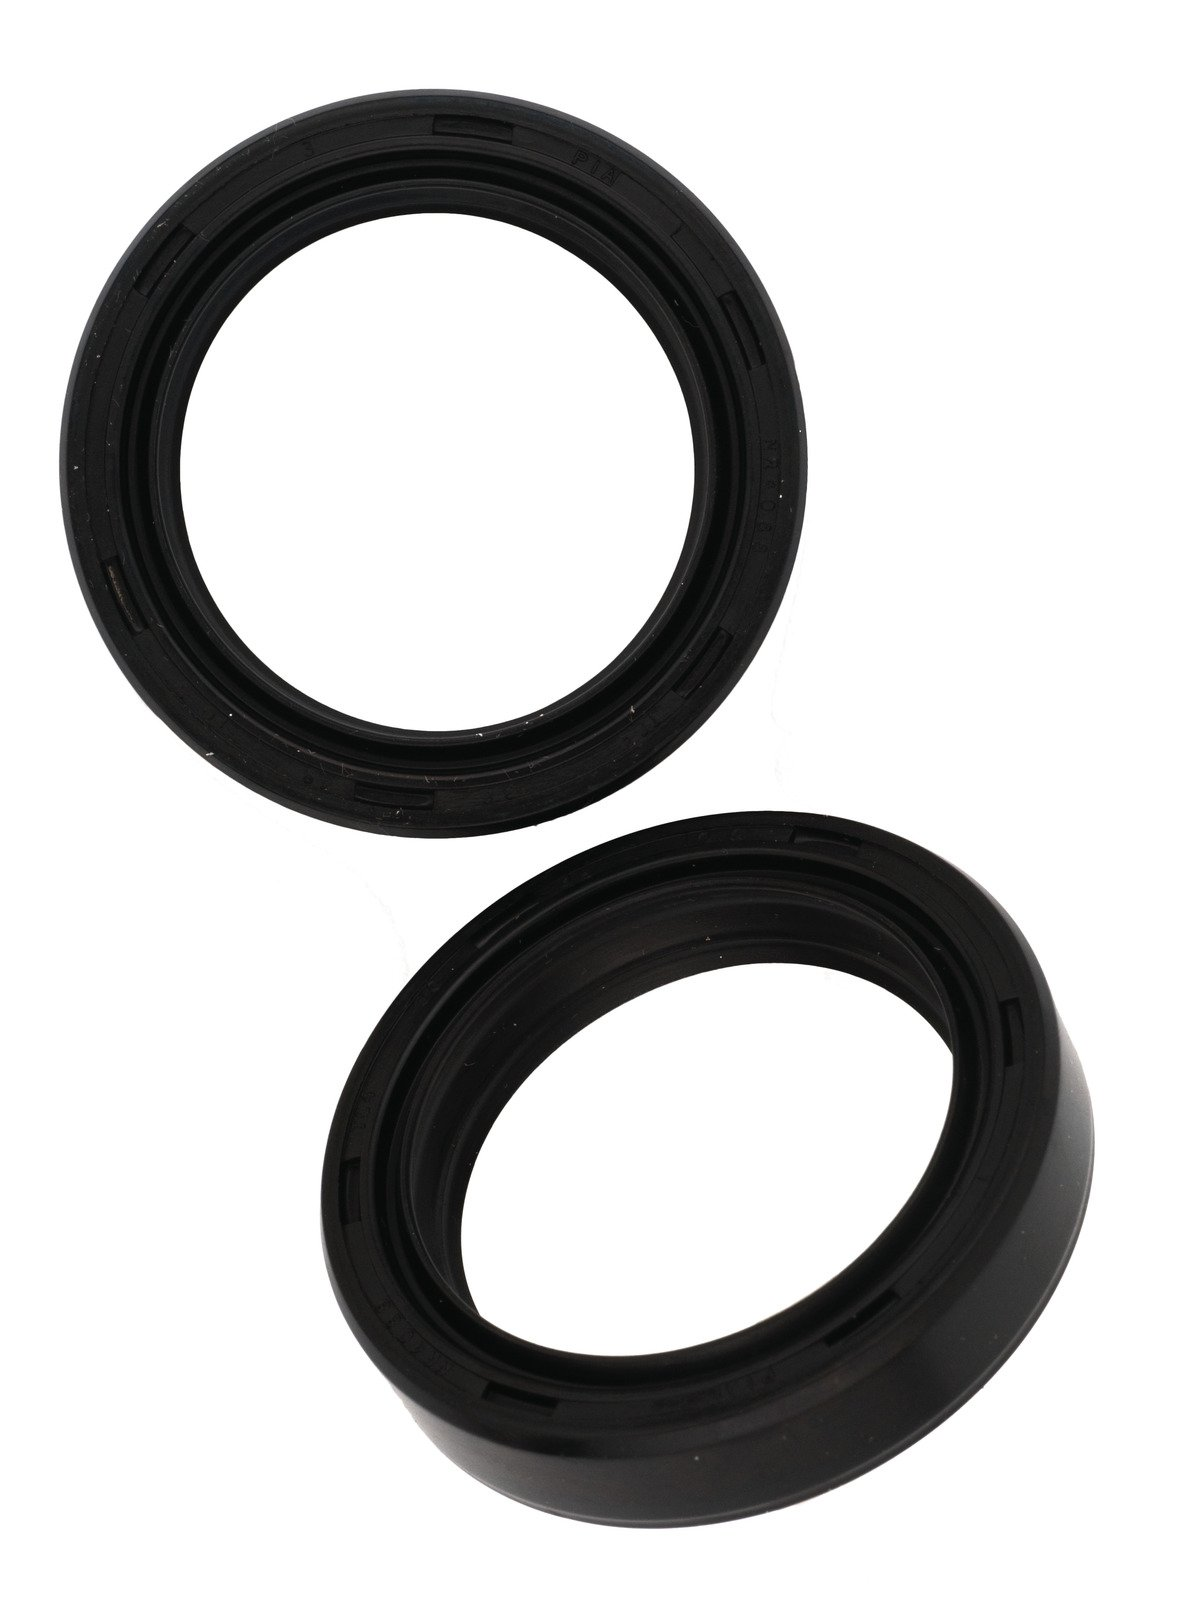 Front Fork Oil Seal Set 36x48x10.5mm - 2pcs, Pair 03-010